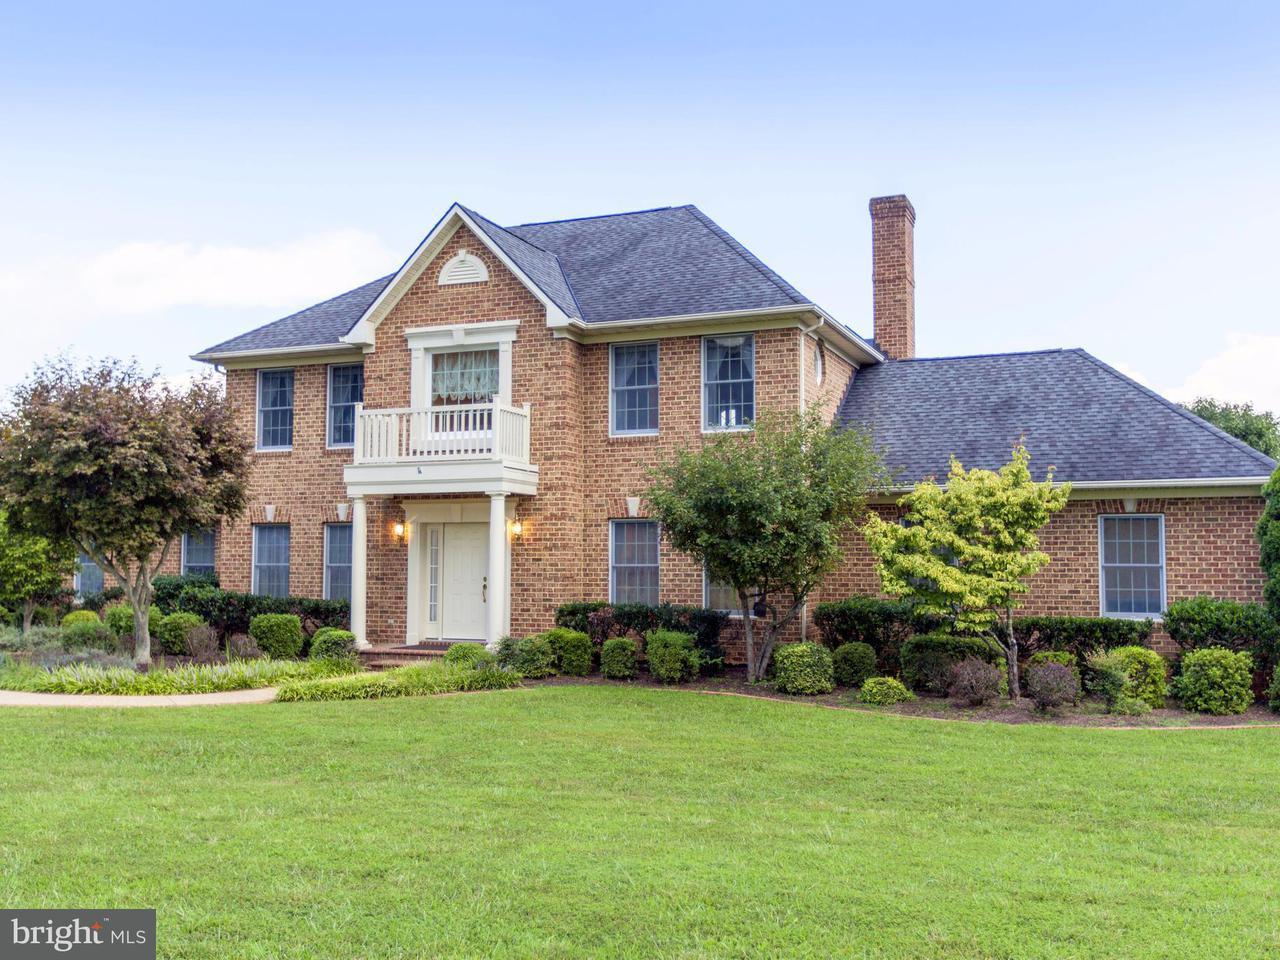 獨棟家庭住宅 為 出售 在 2072 SEVILLE Road 2072 SEVILLE Road Madison, 弗吉尼亞州 22727 美國